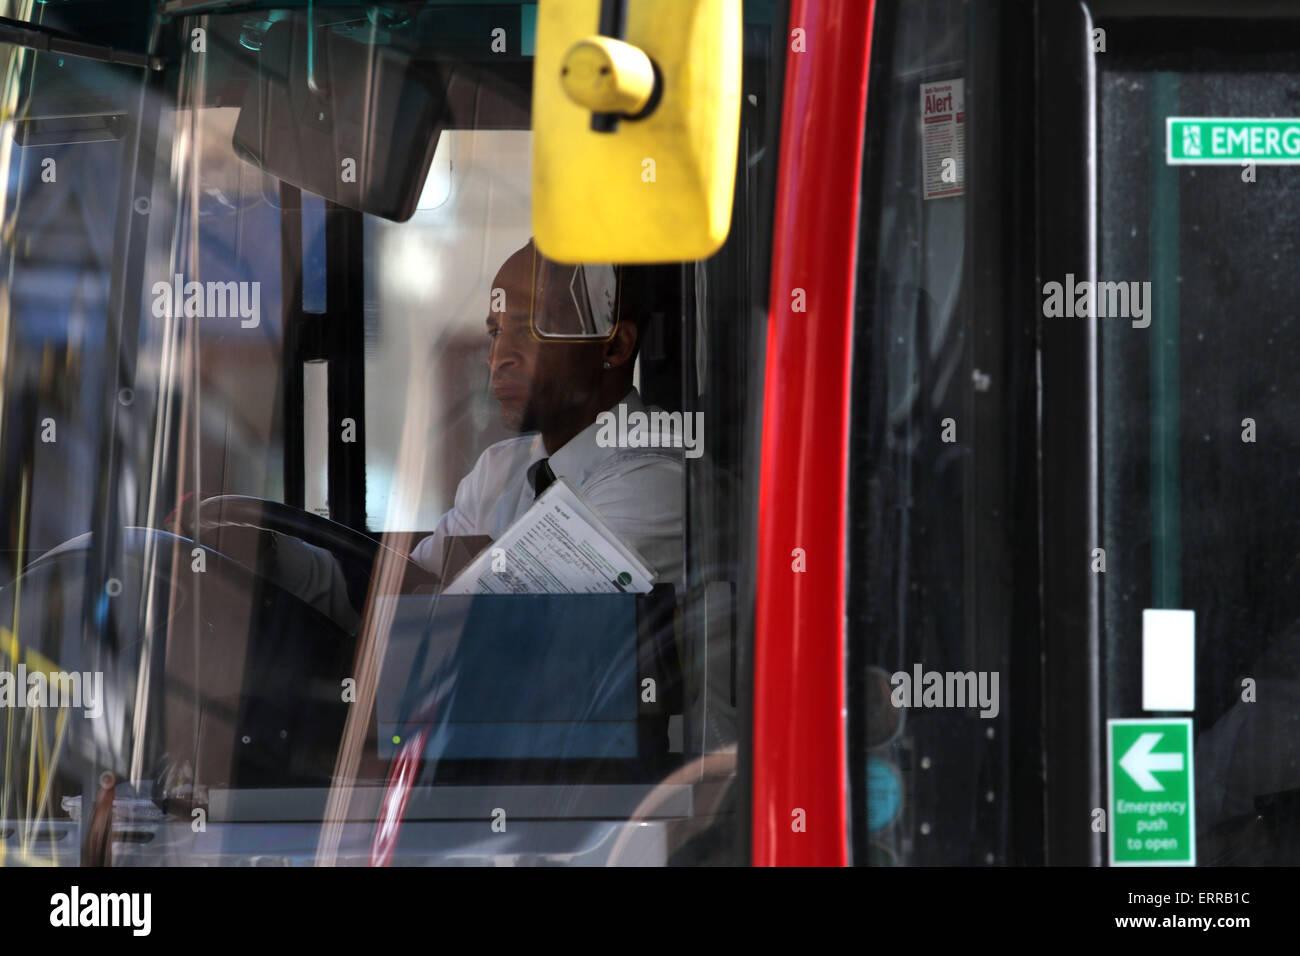 London Bus Fahrer stecken im Stau fahren rot Stockbild